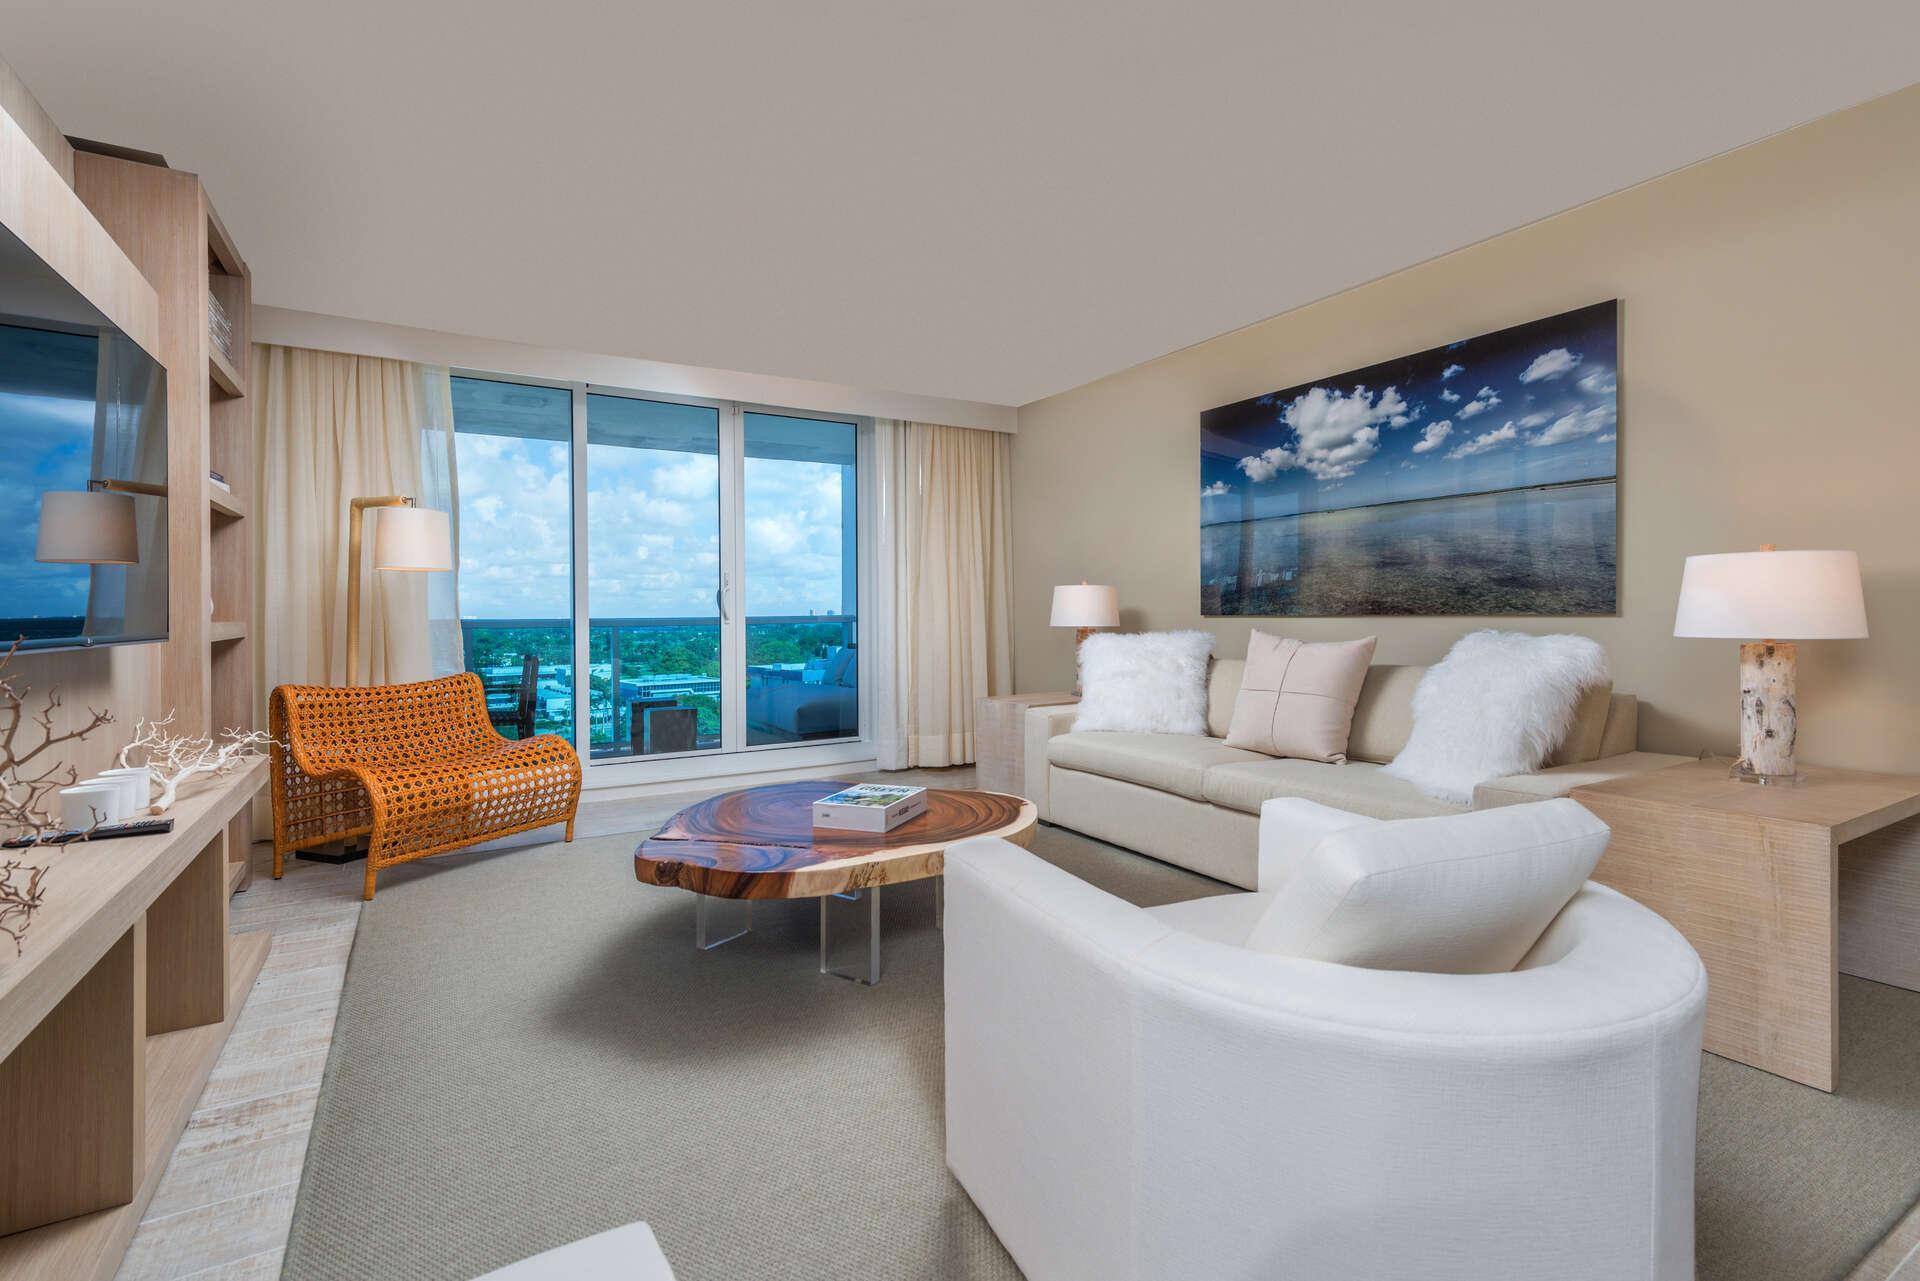 Luxury vacation rentals usa - Florida - Miami beach - Eco hotel southbeach - #1127 | 1 BDM City View - Image 1/16